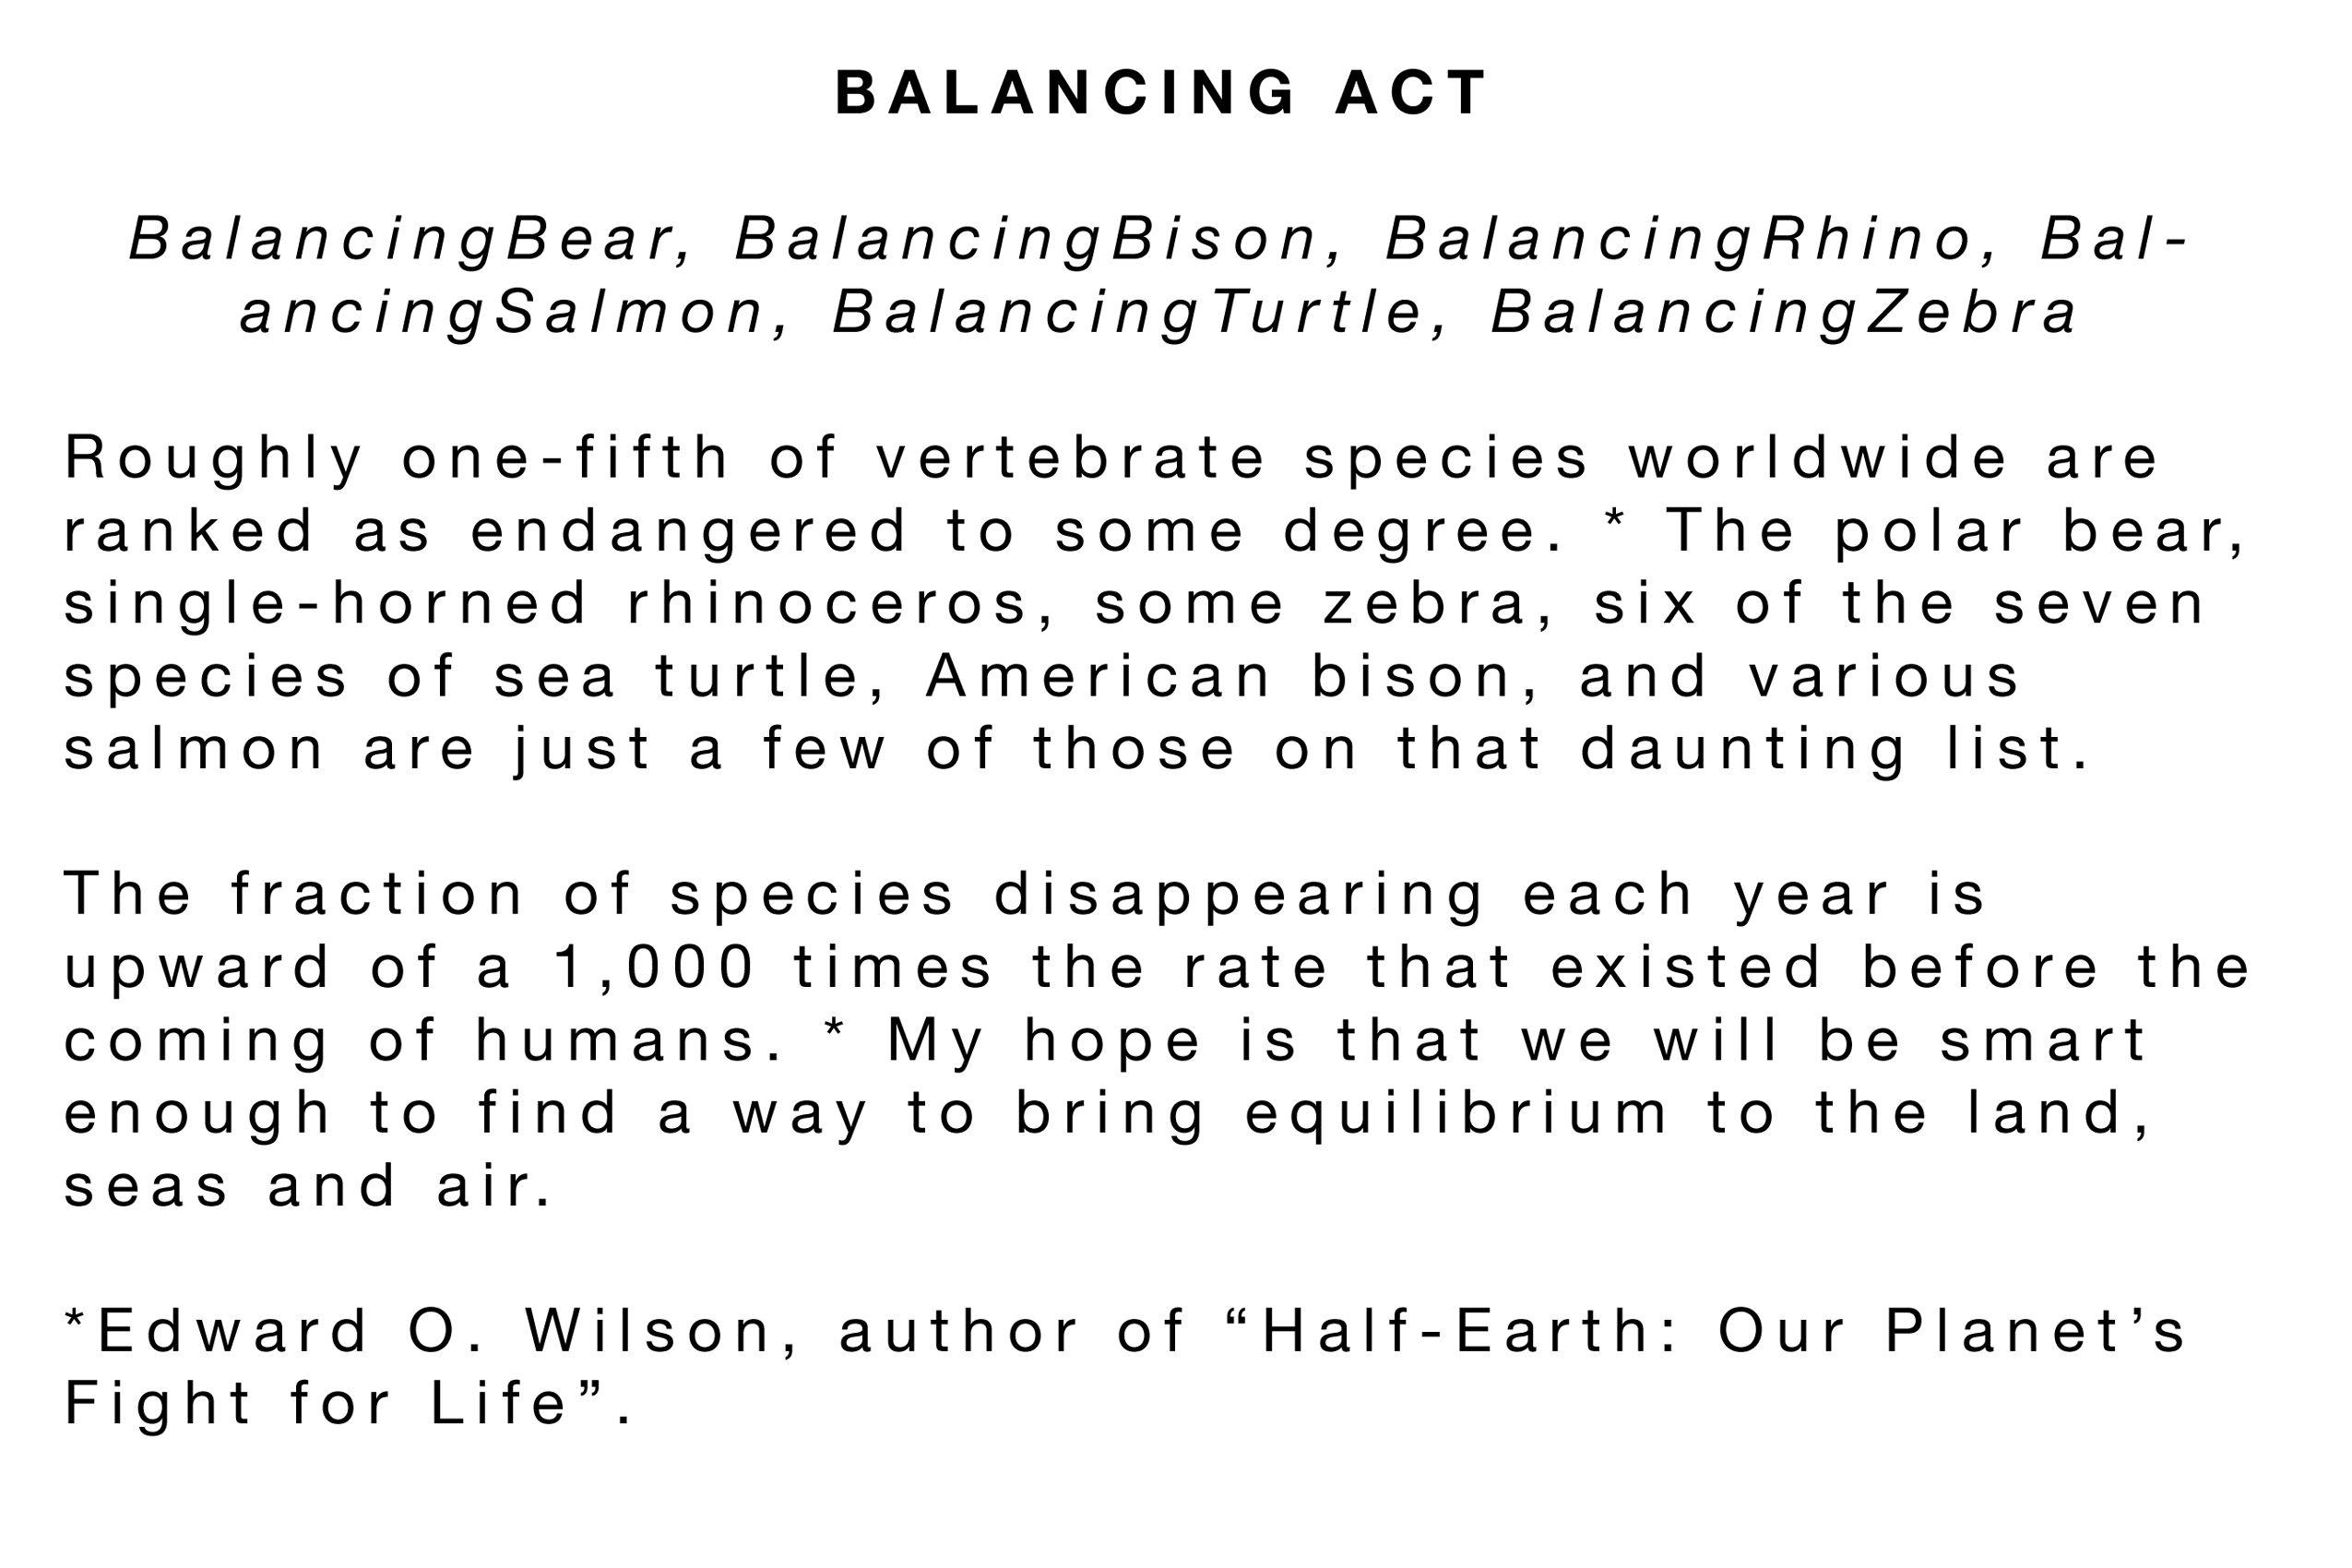 BalancingAct Statement